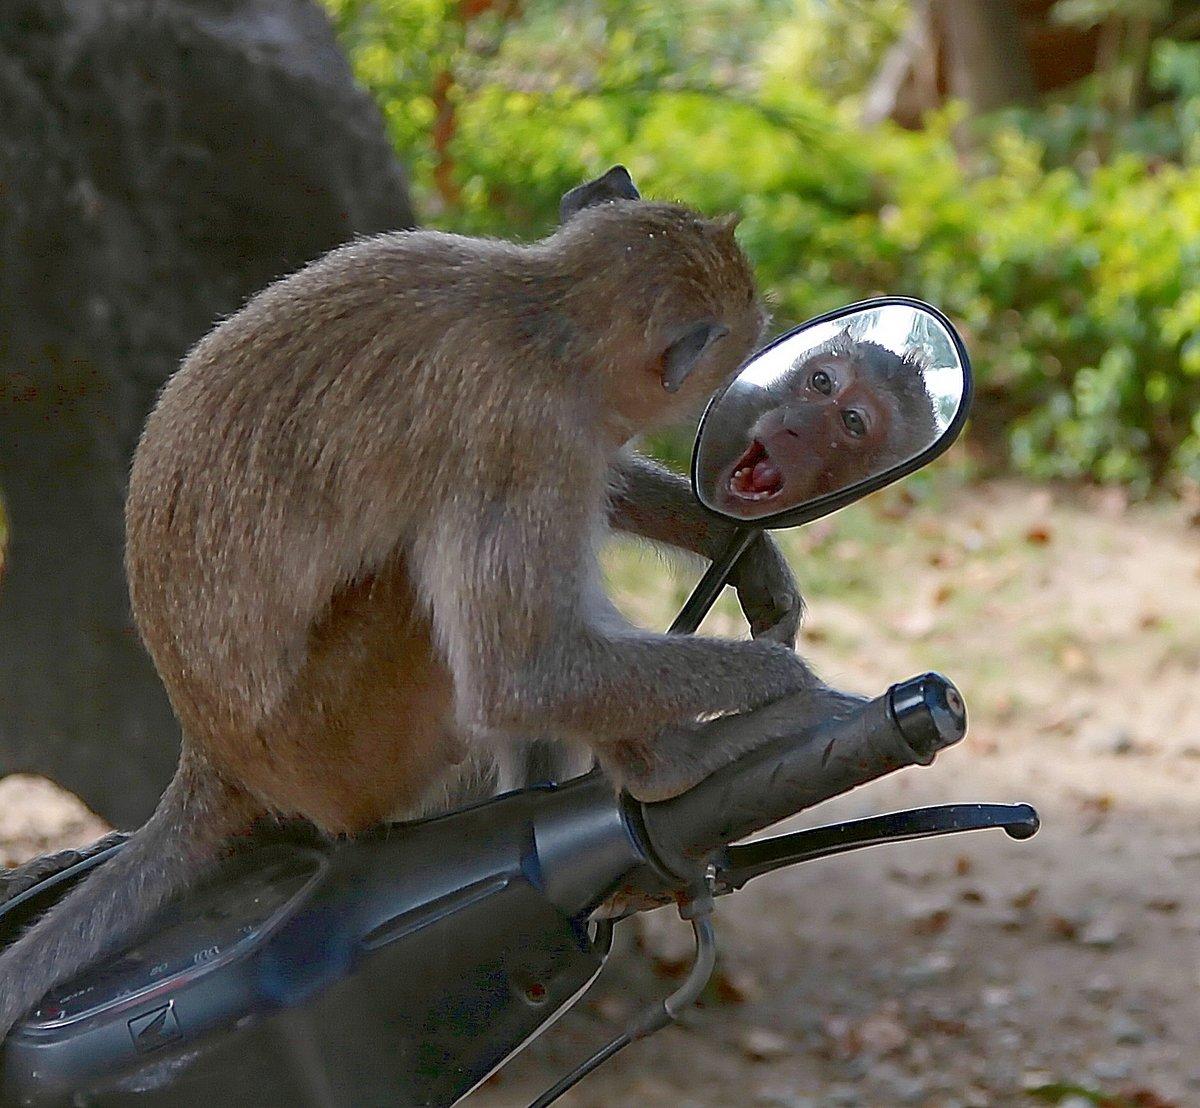 По дороге с облаками обезьянка картинки замочками, по-модному